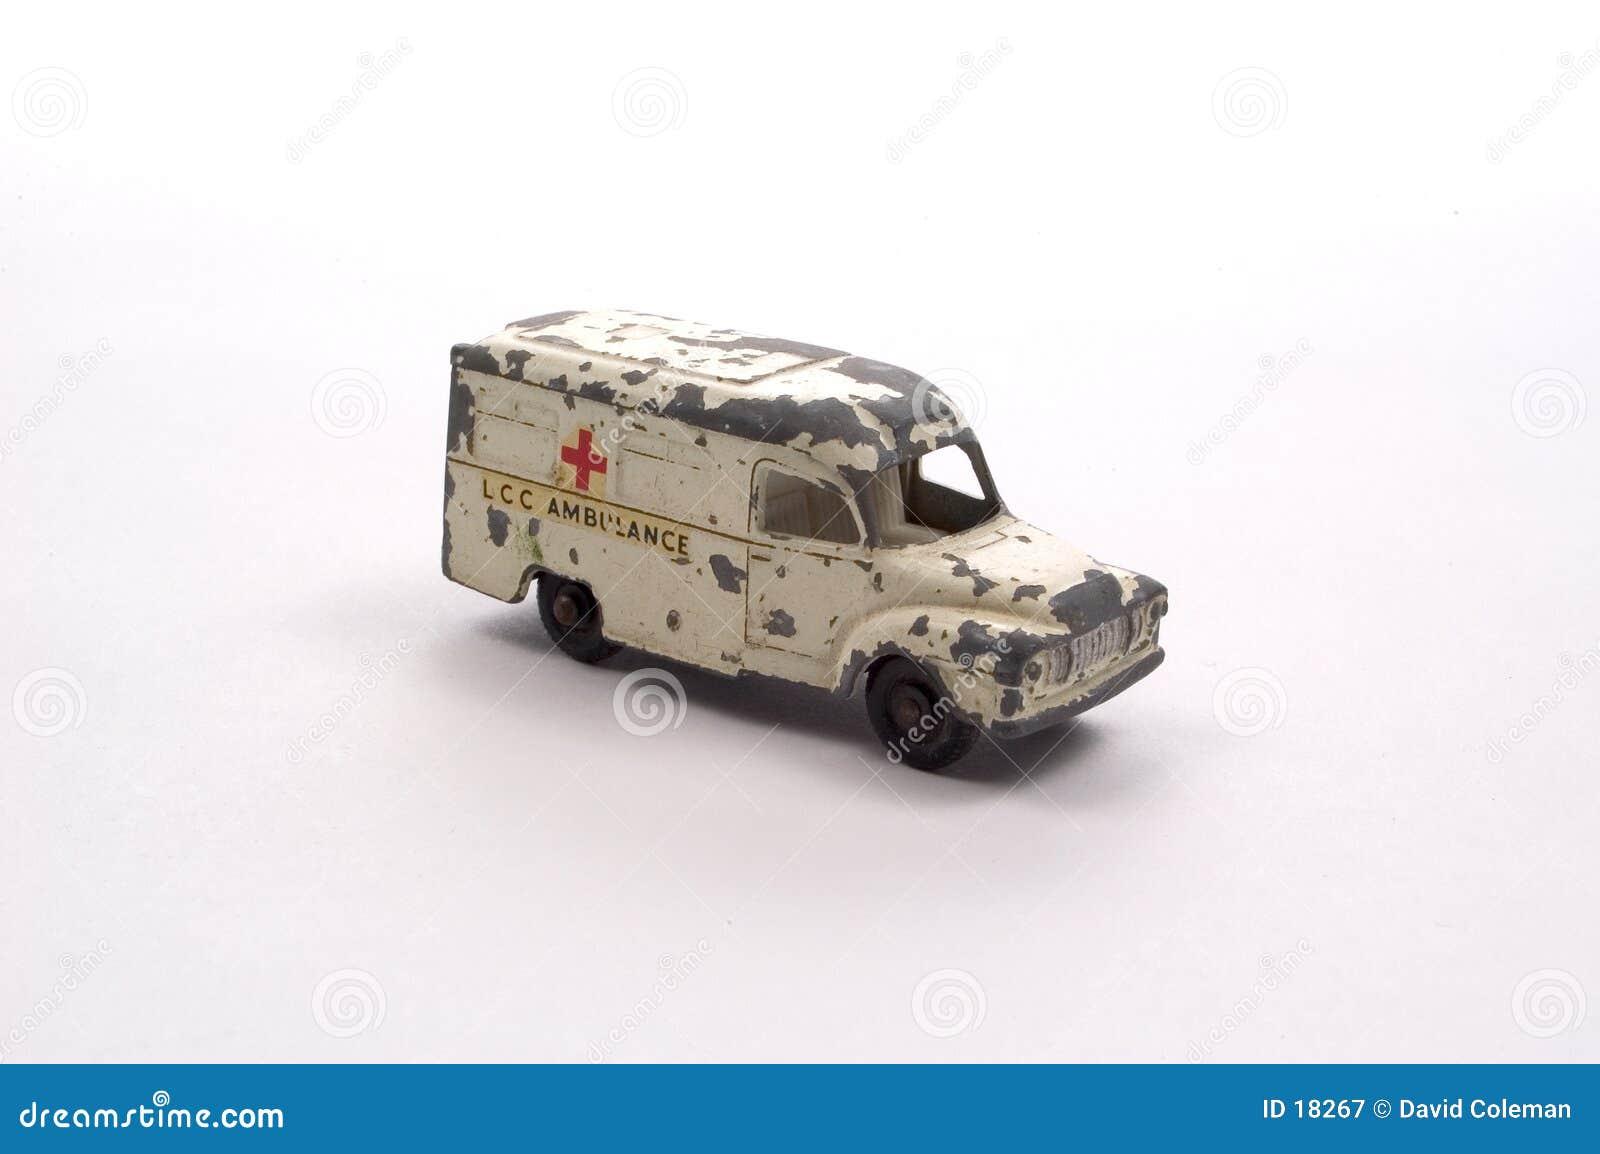 Antique Toy Ambulance